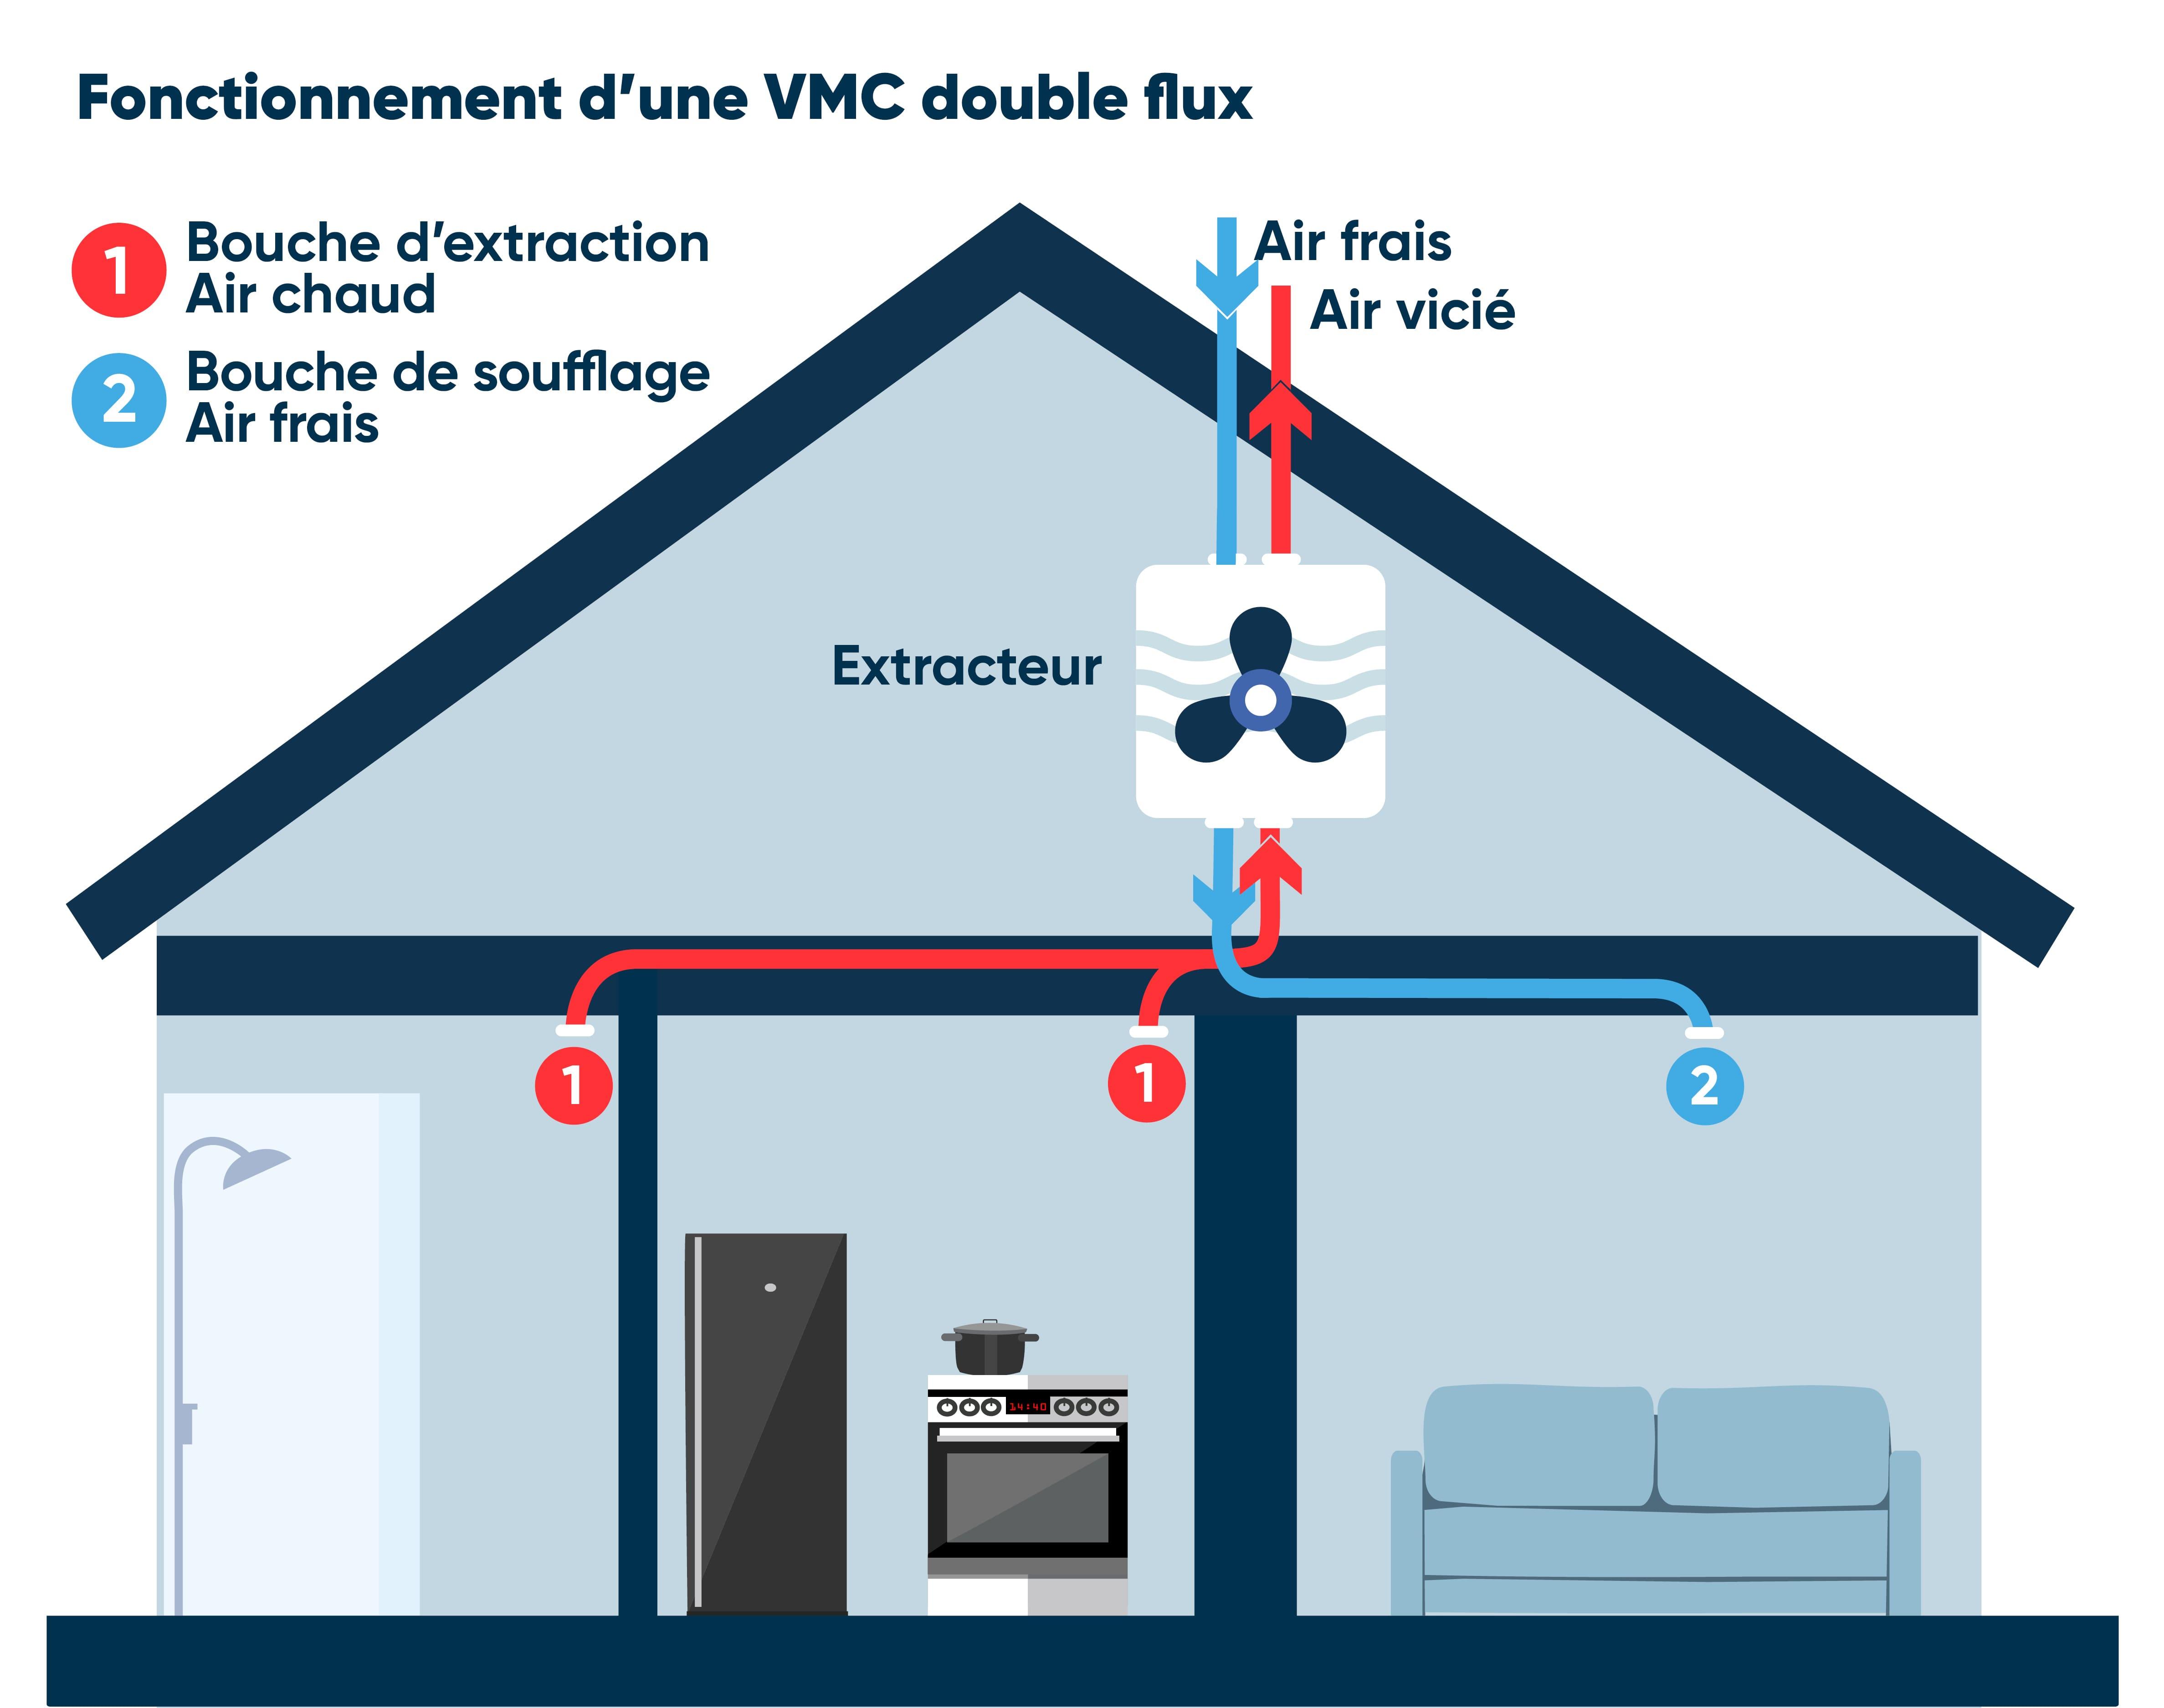 VMS double flux